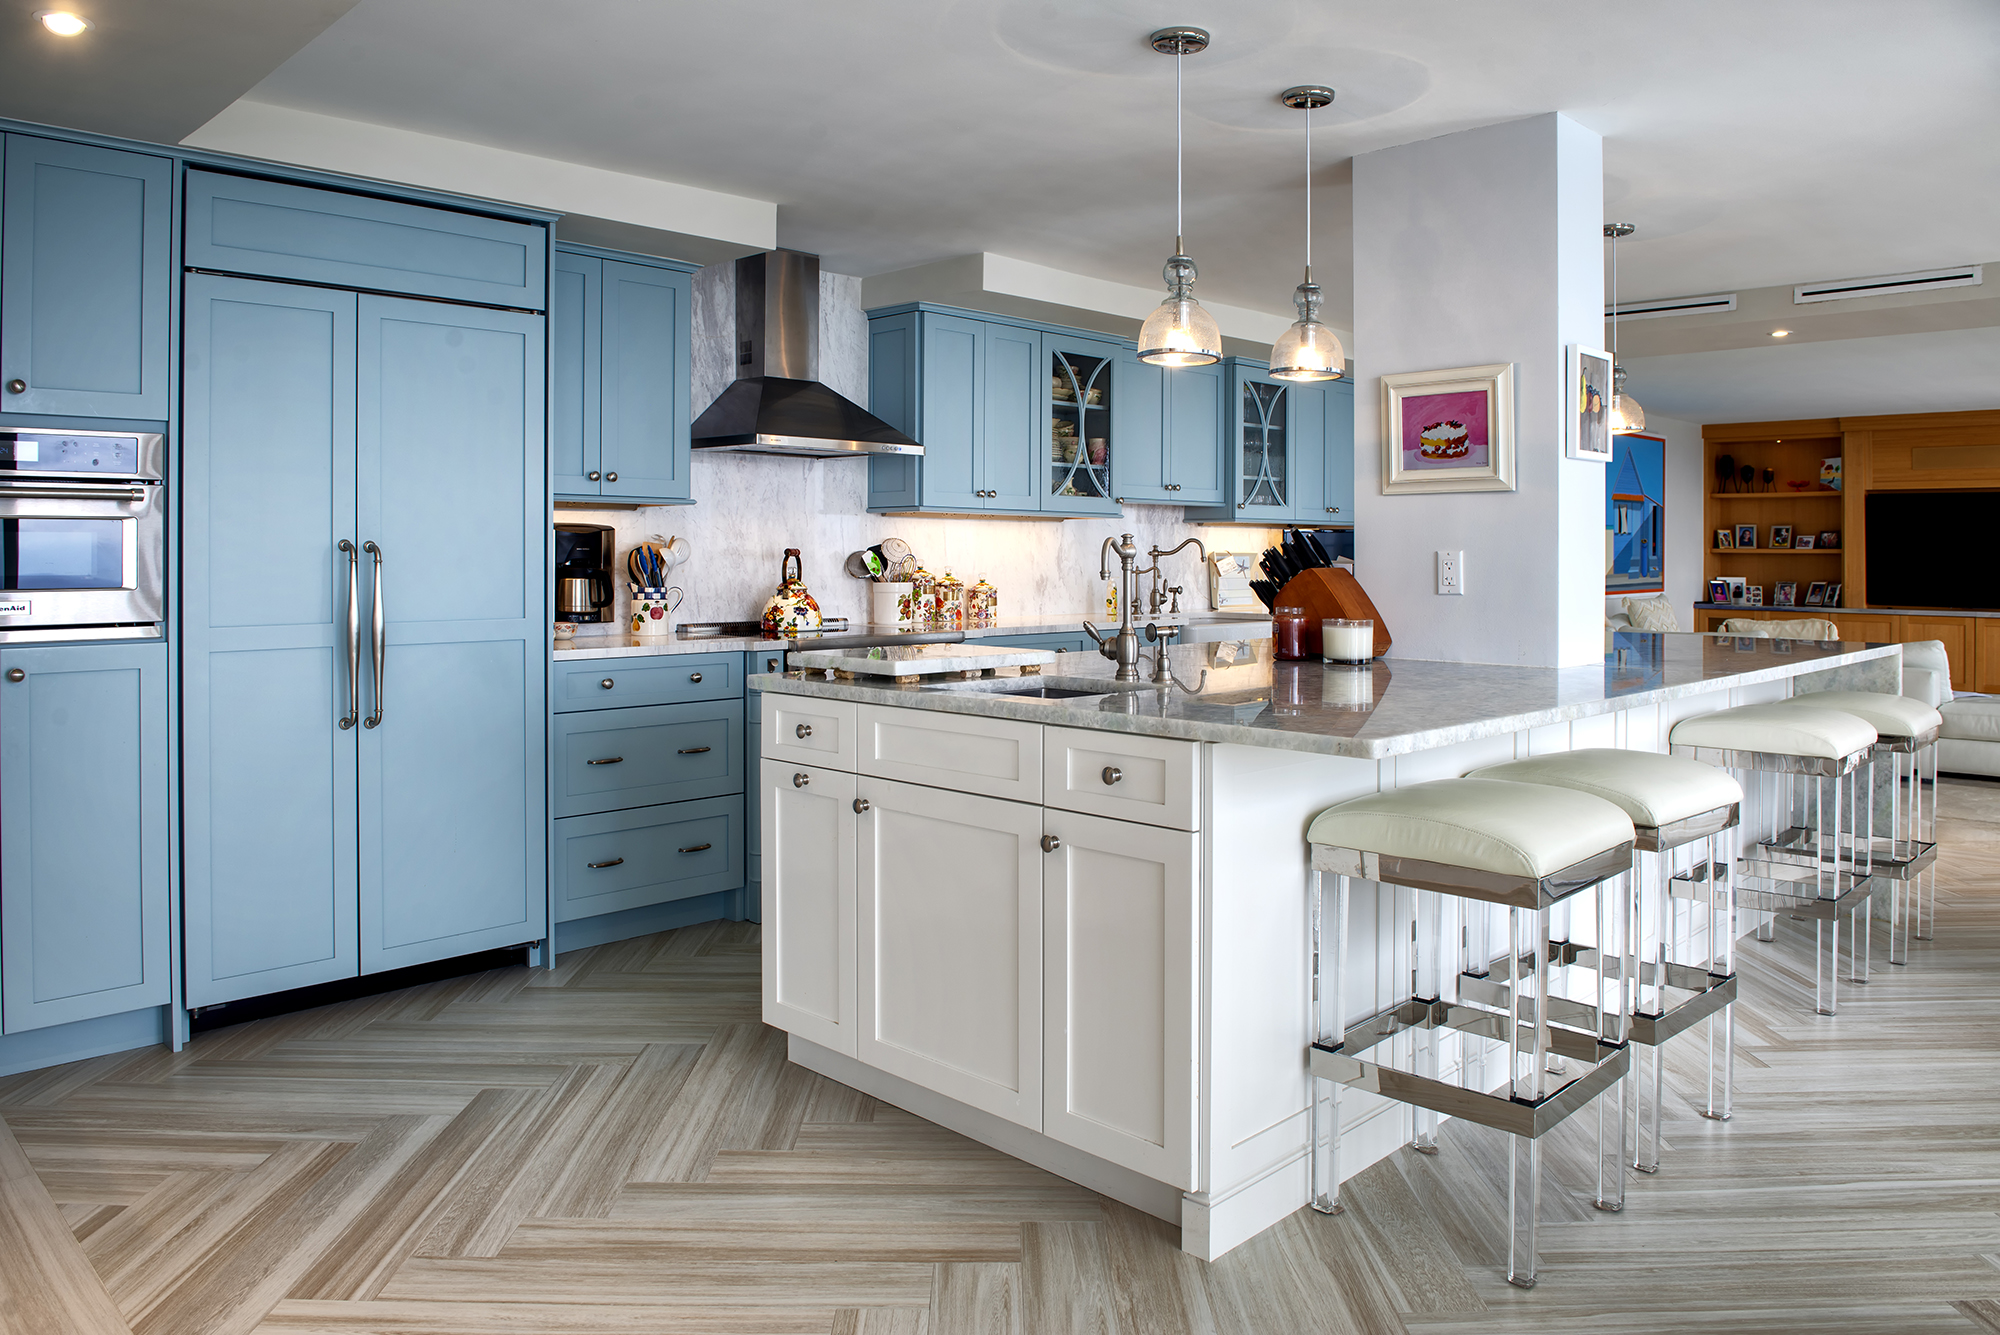 Wood-Mode Oceanside blue cabinets with the herringbone pattern plank flooring tile.